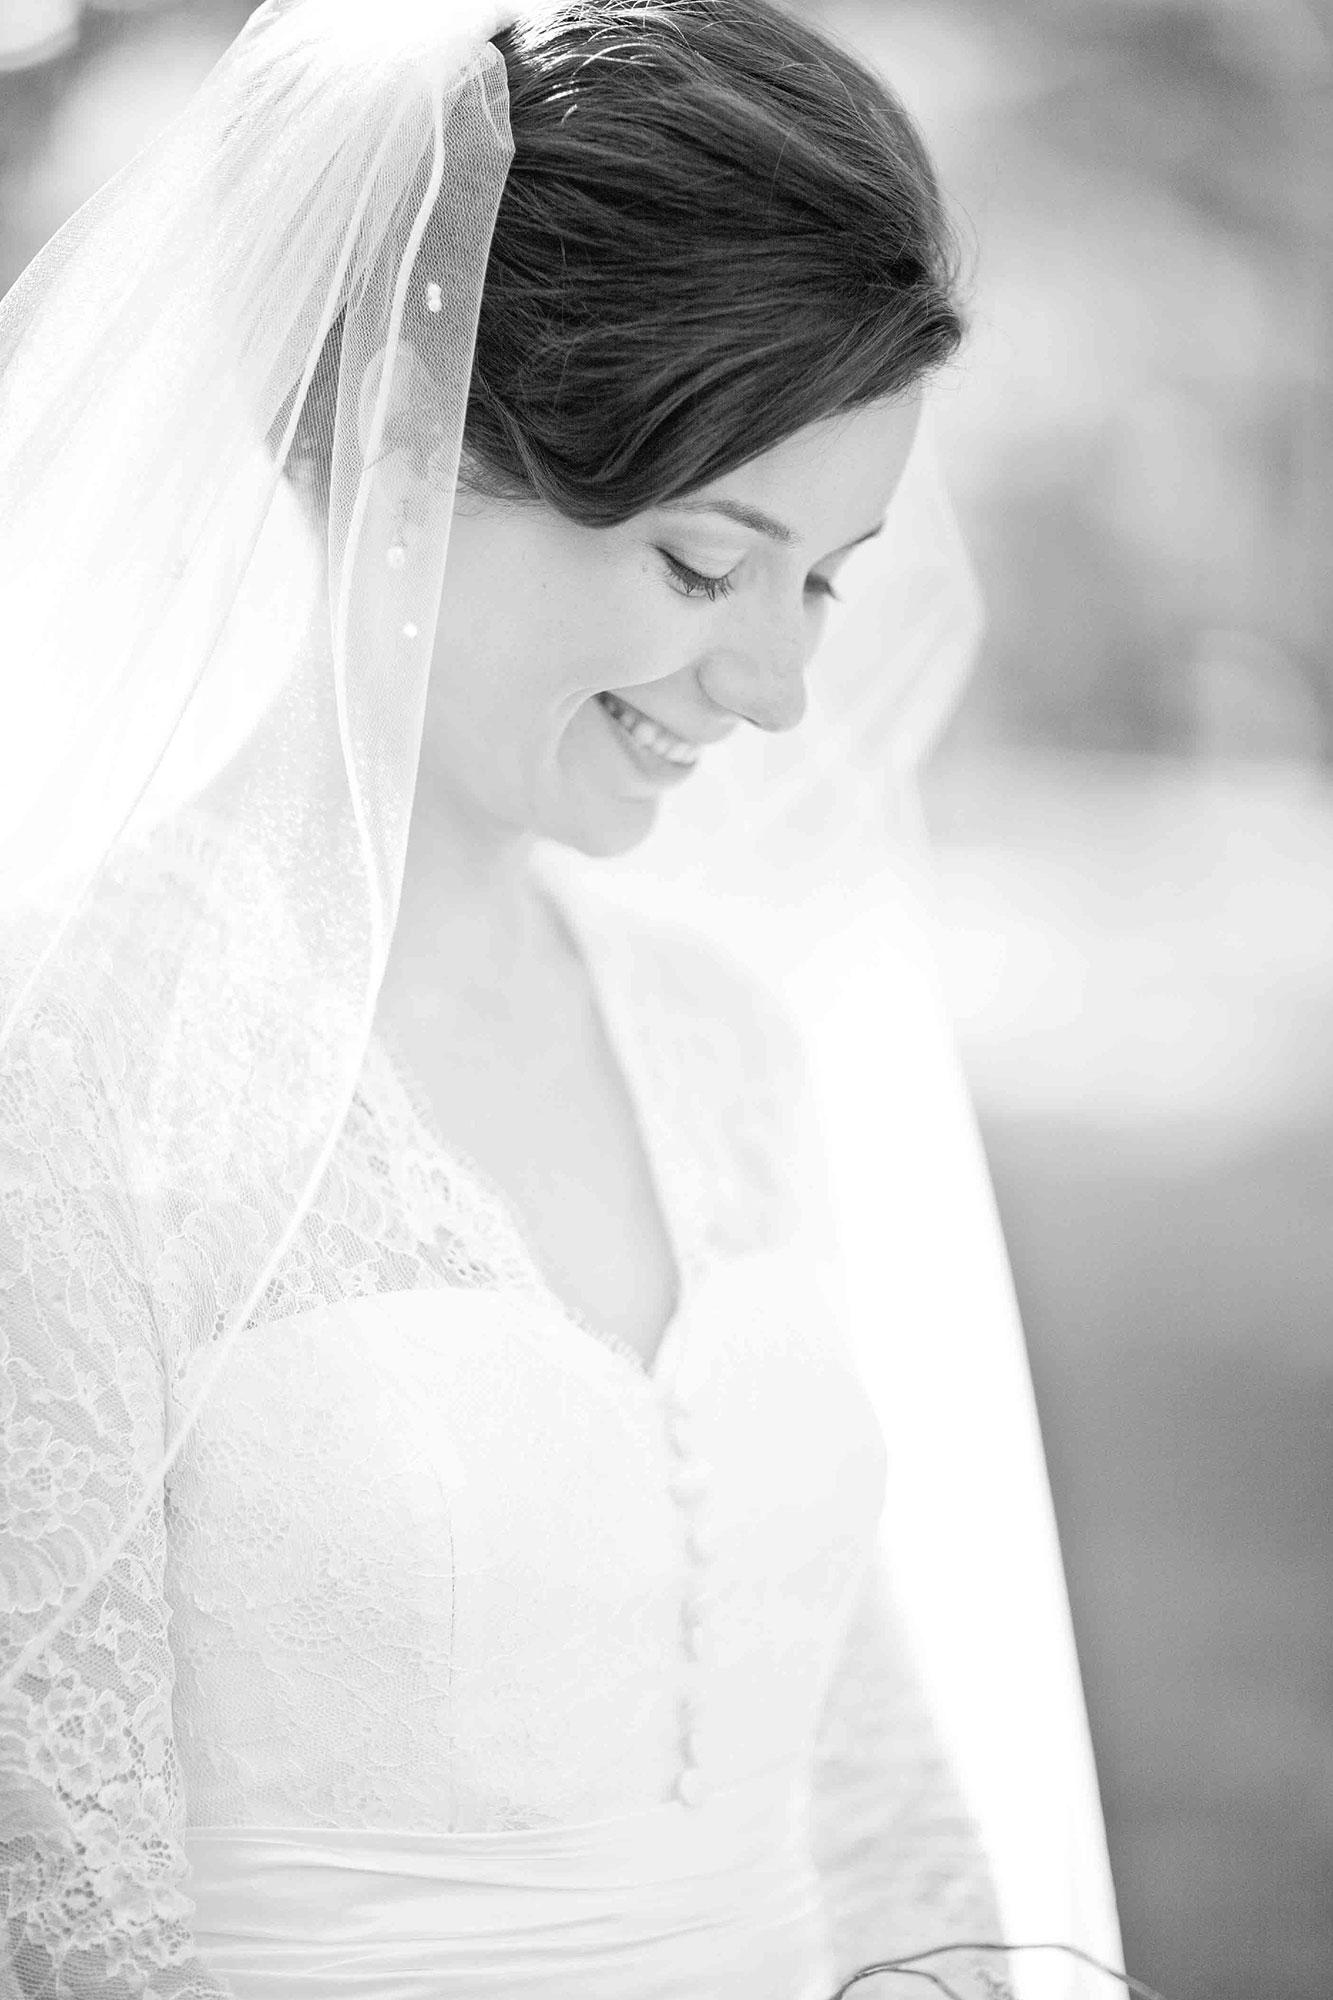 Amanda-Cowley-Willowbank-Vineyard-Bride-Photo-By-White-Photographie-023.jpg